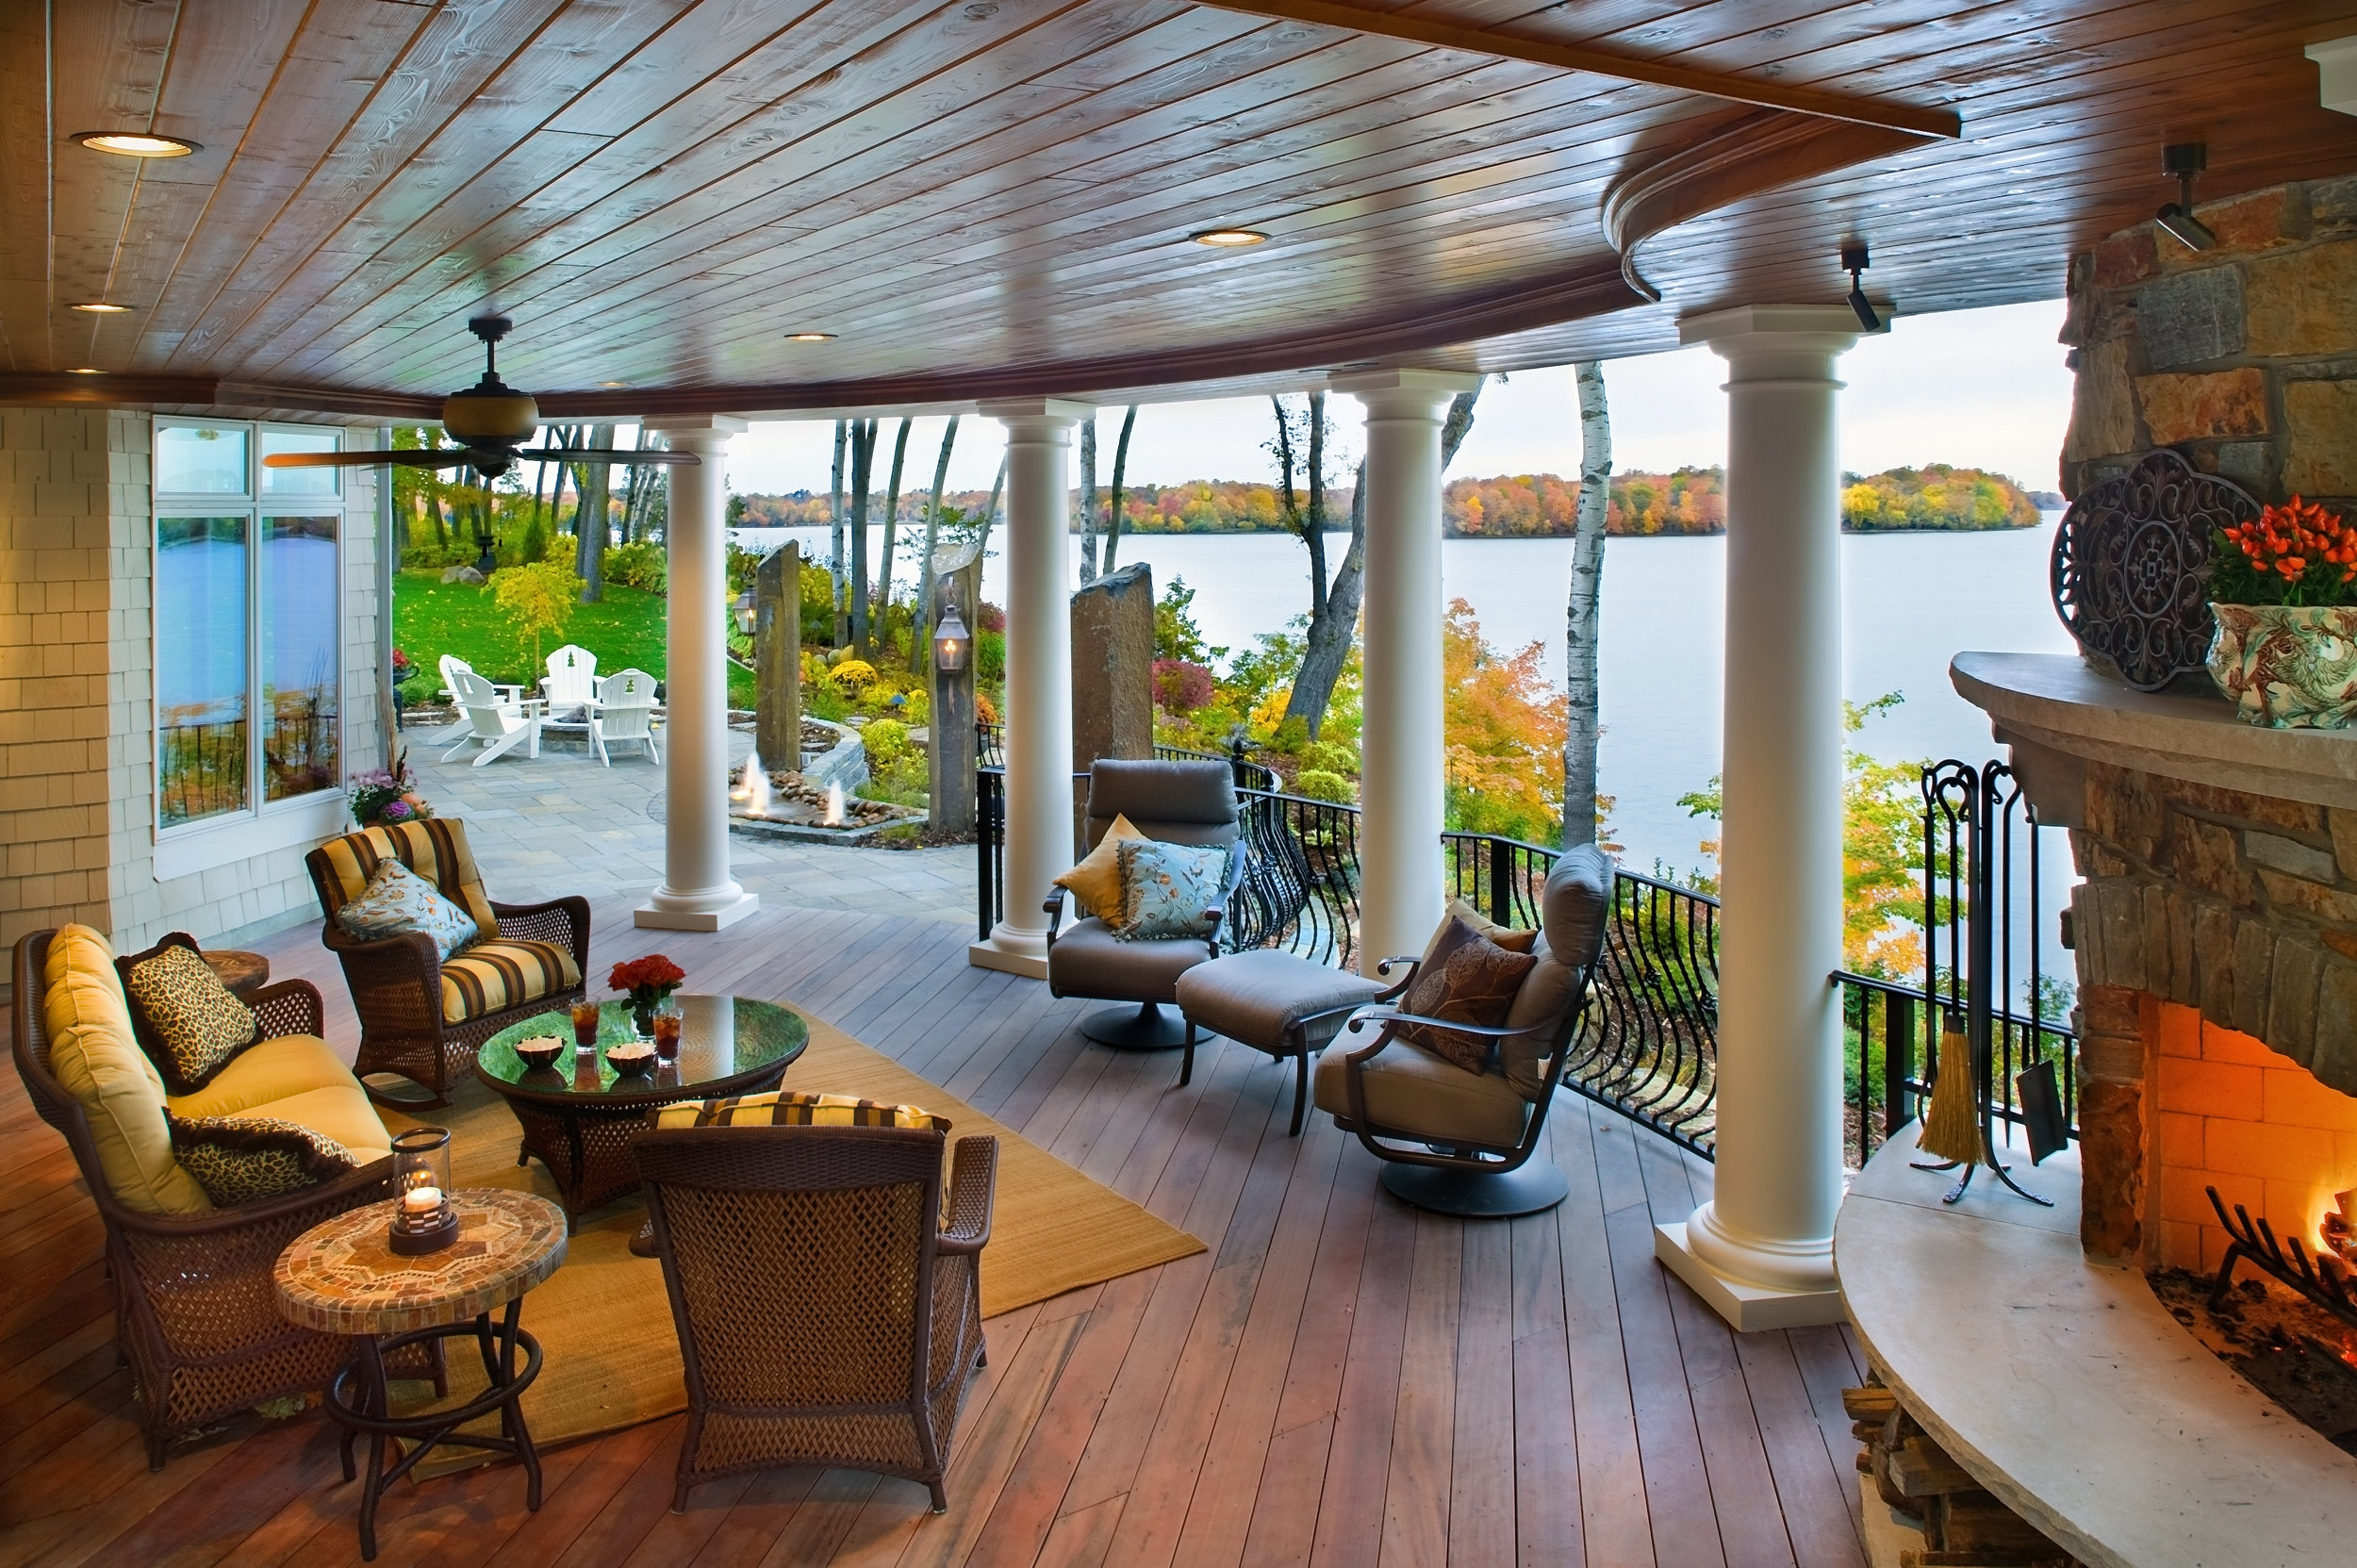 Moms Design Build - Lake Minnetonka Hardwood Deck Fireplace